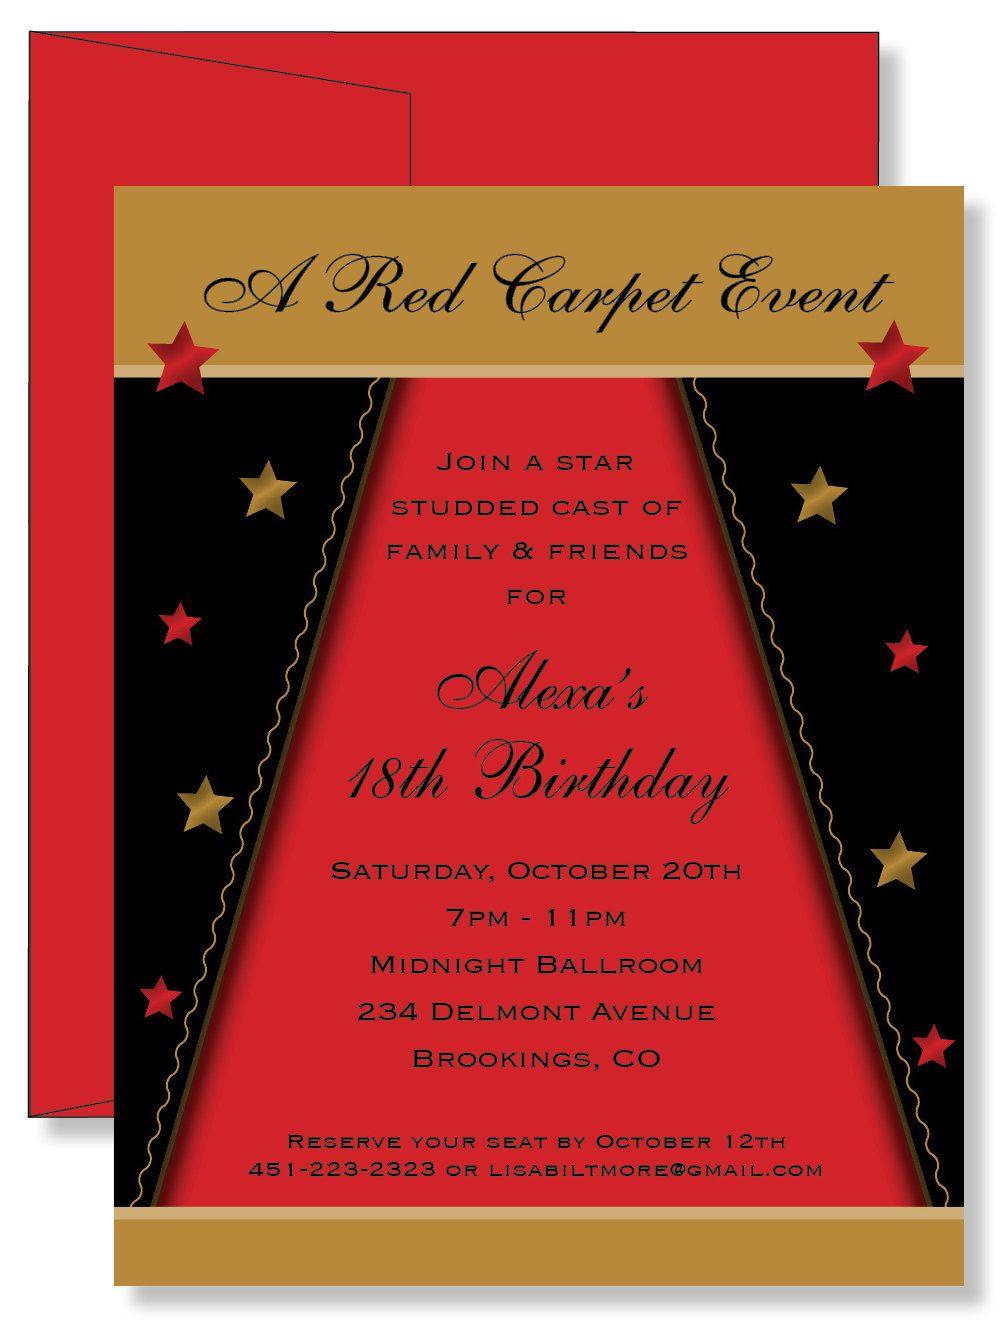 Red Carpet Invitations – Invitation Samples 2014 | Tree skirt ...